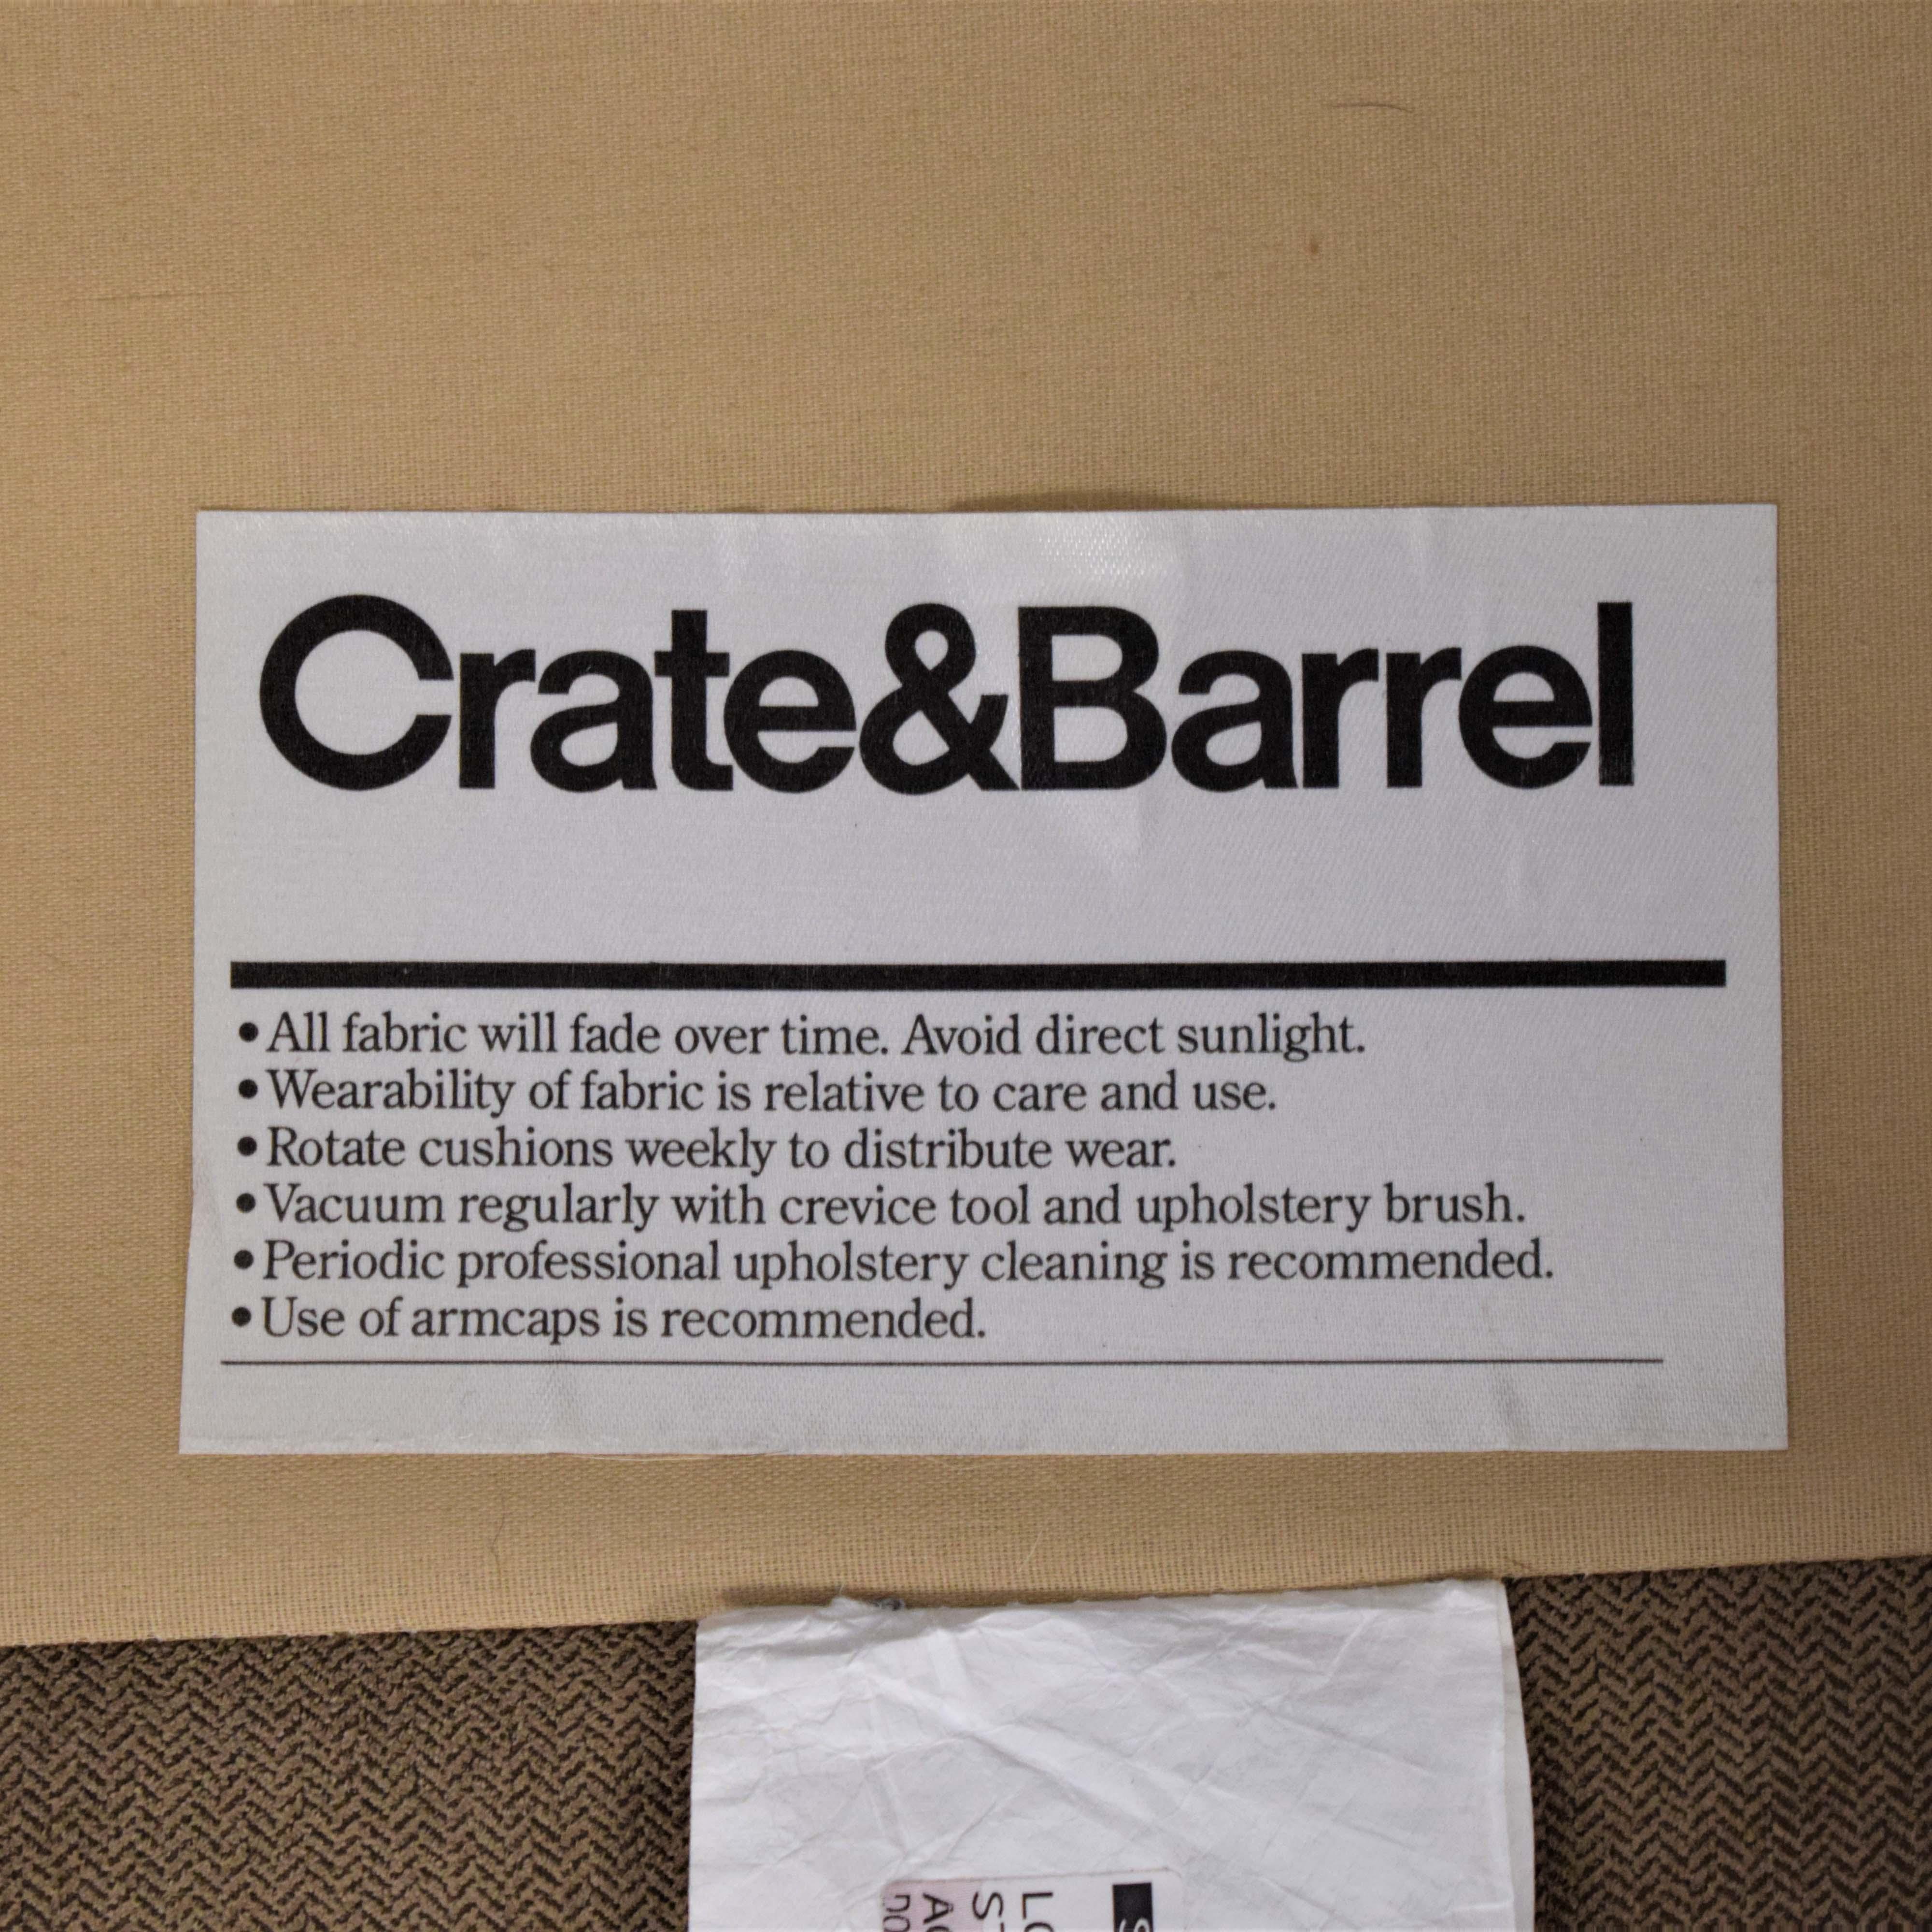 Crate & Barrel Crate & Barrel Axis II 3-Piece Sectional Sofa Sectionals